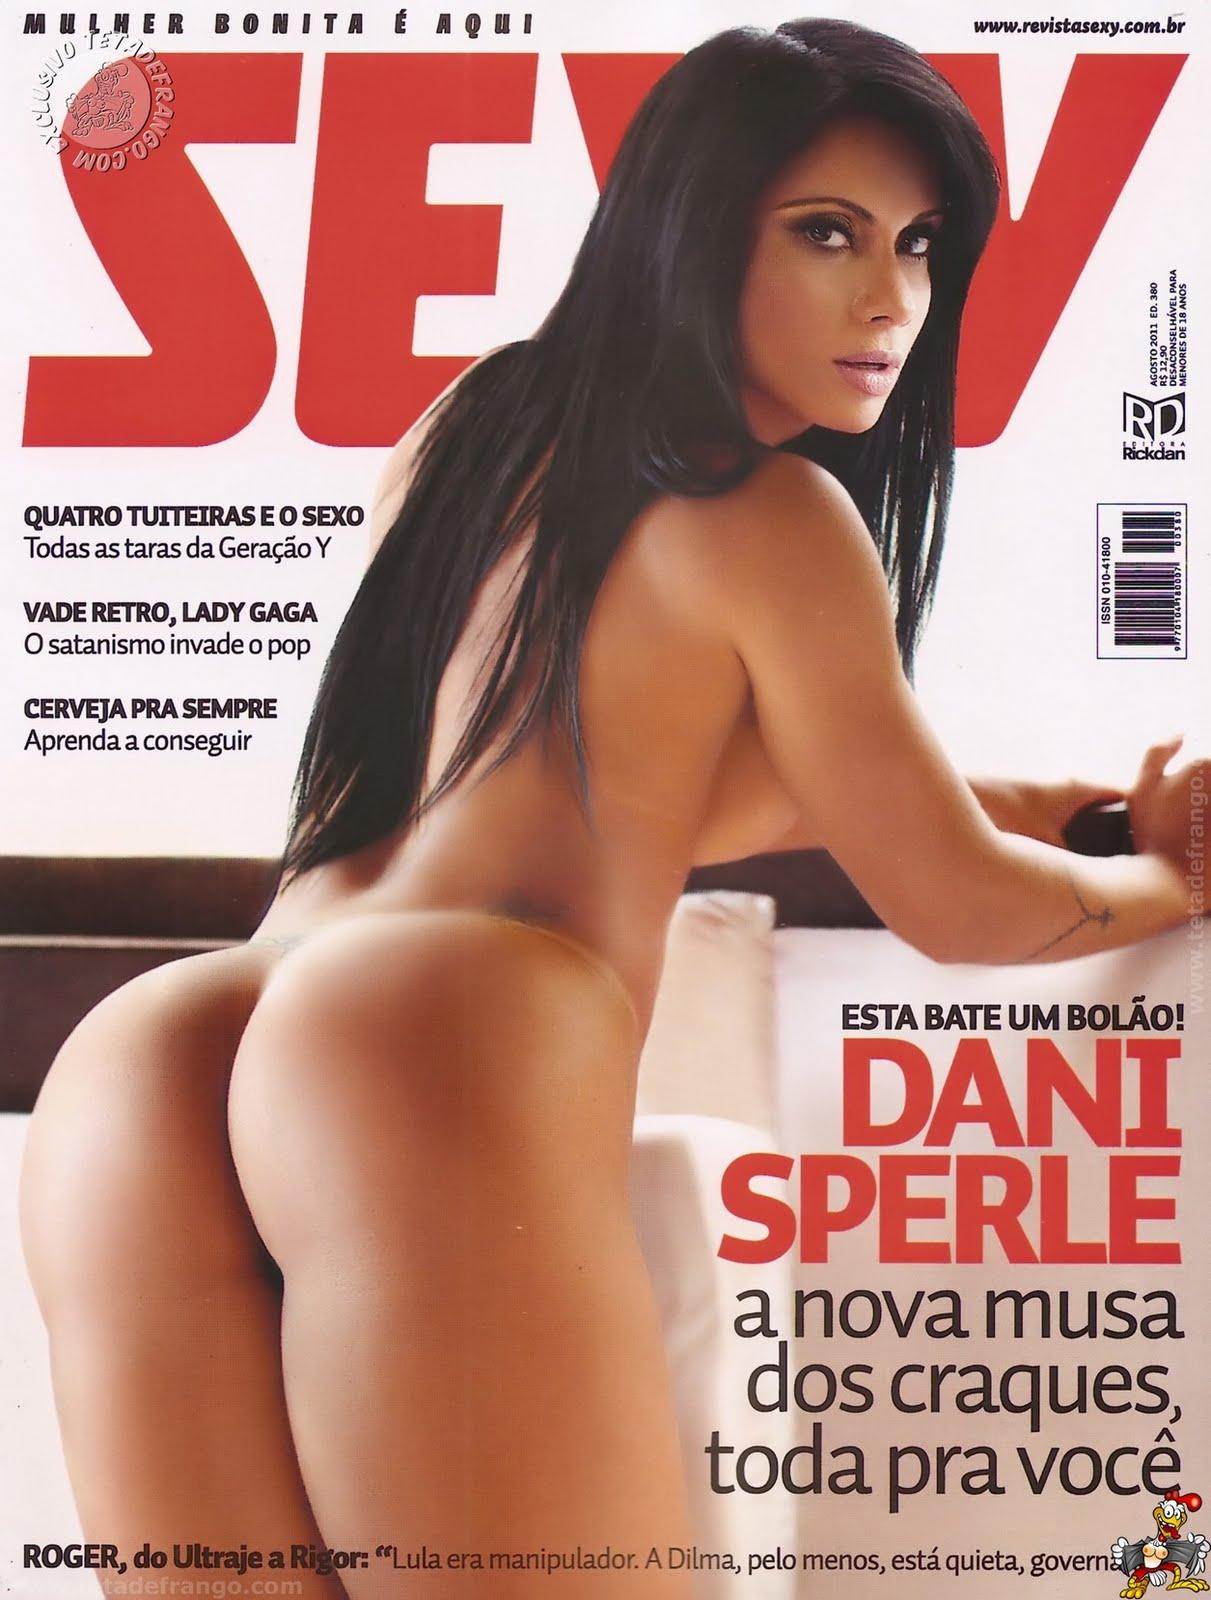 829981635 dani sperle 01 123 144lo naked guys with big dicks